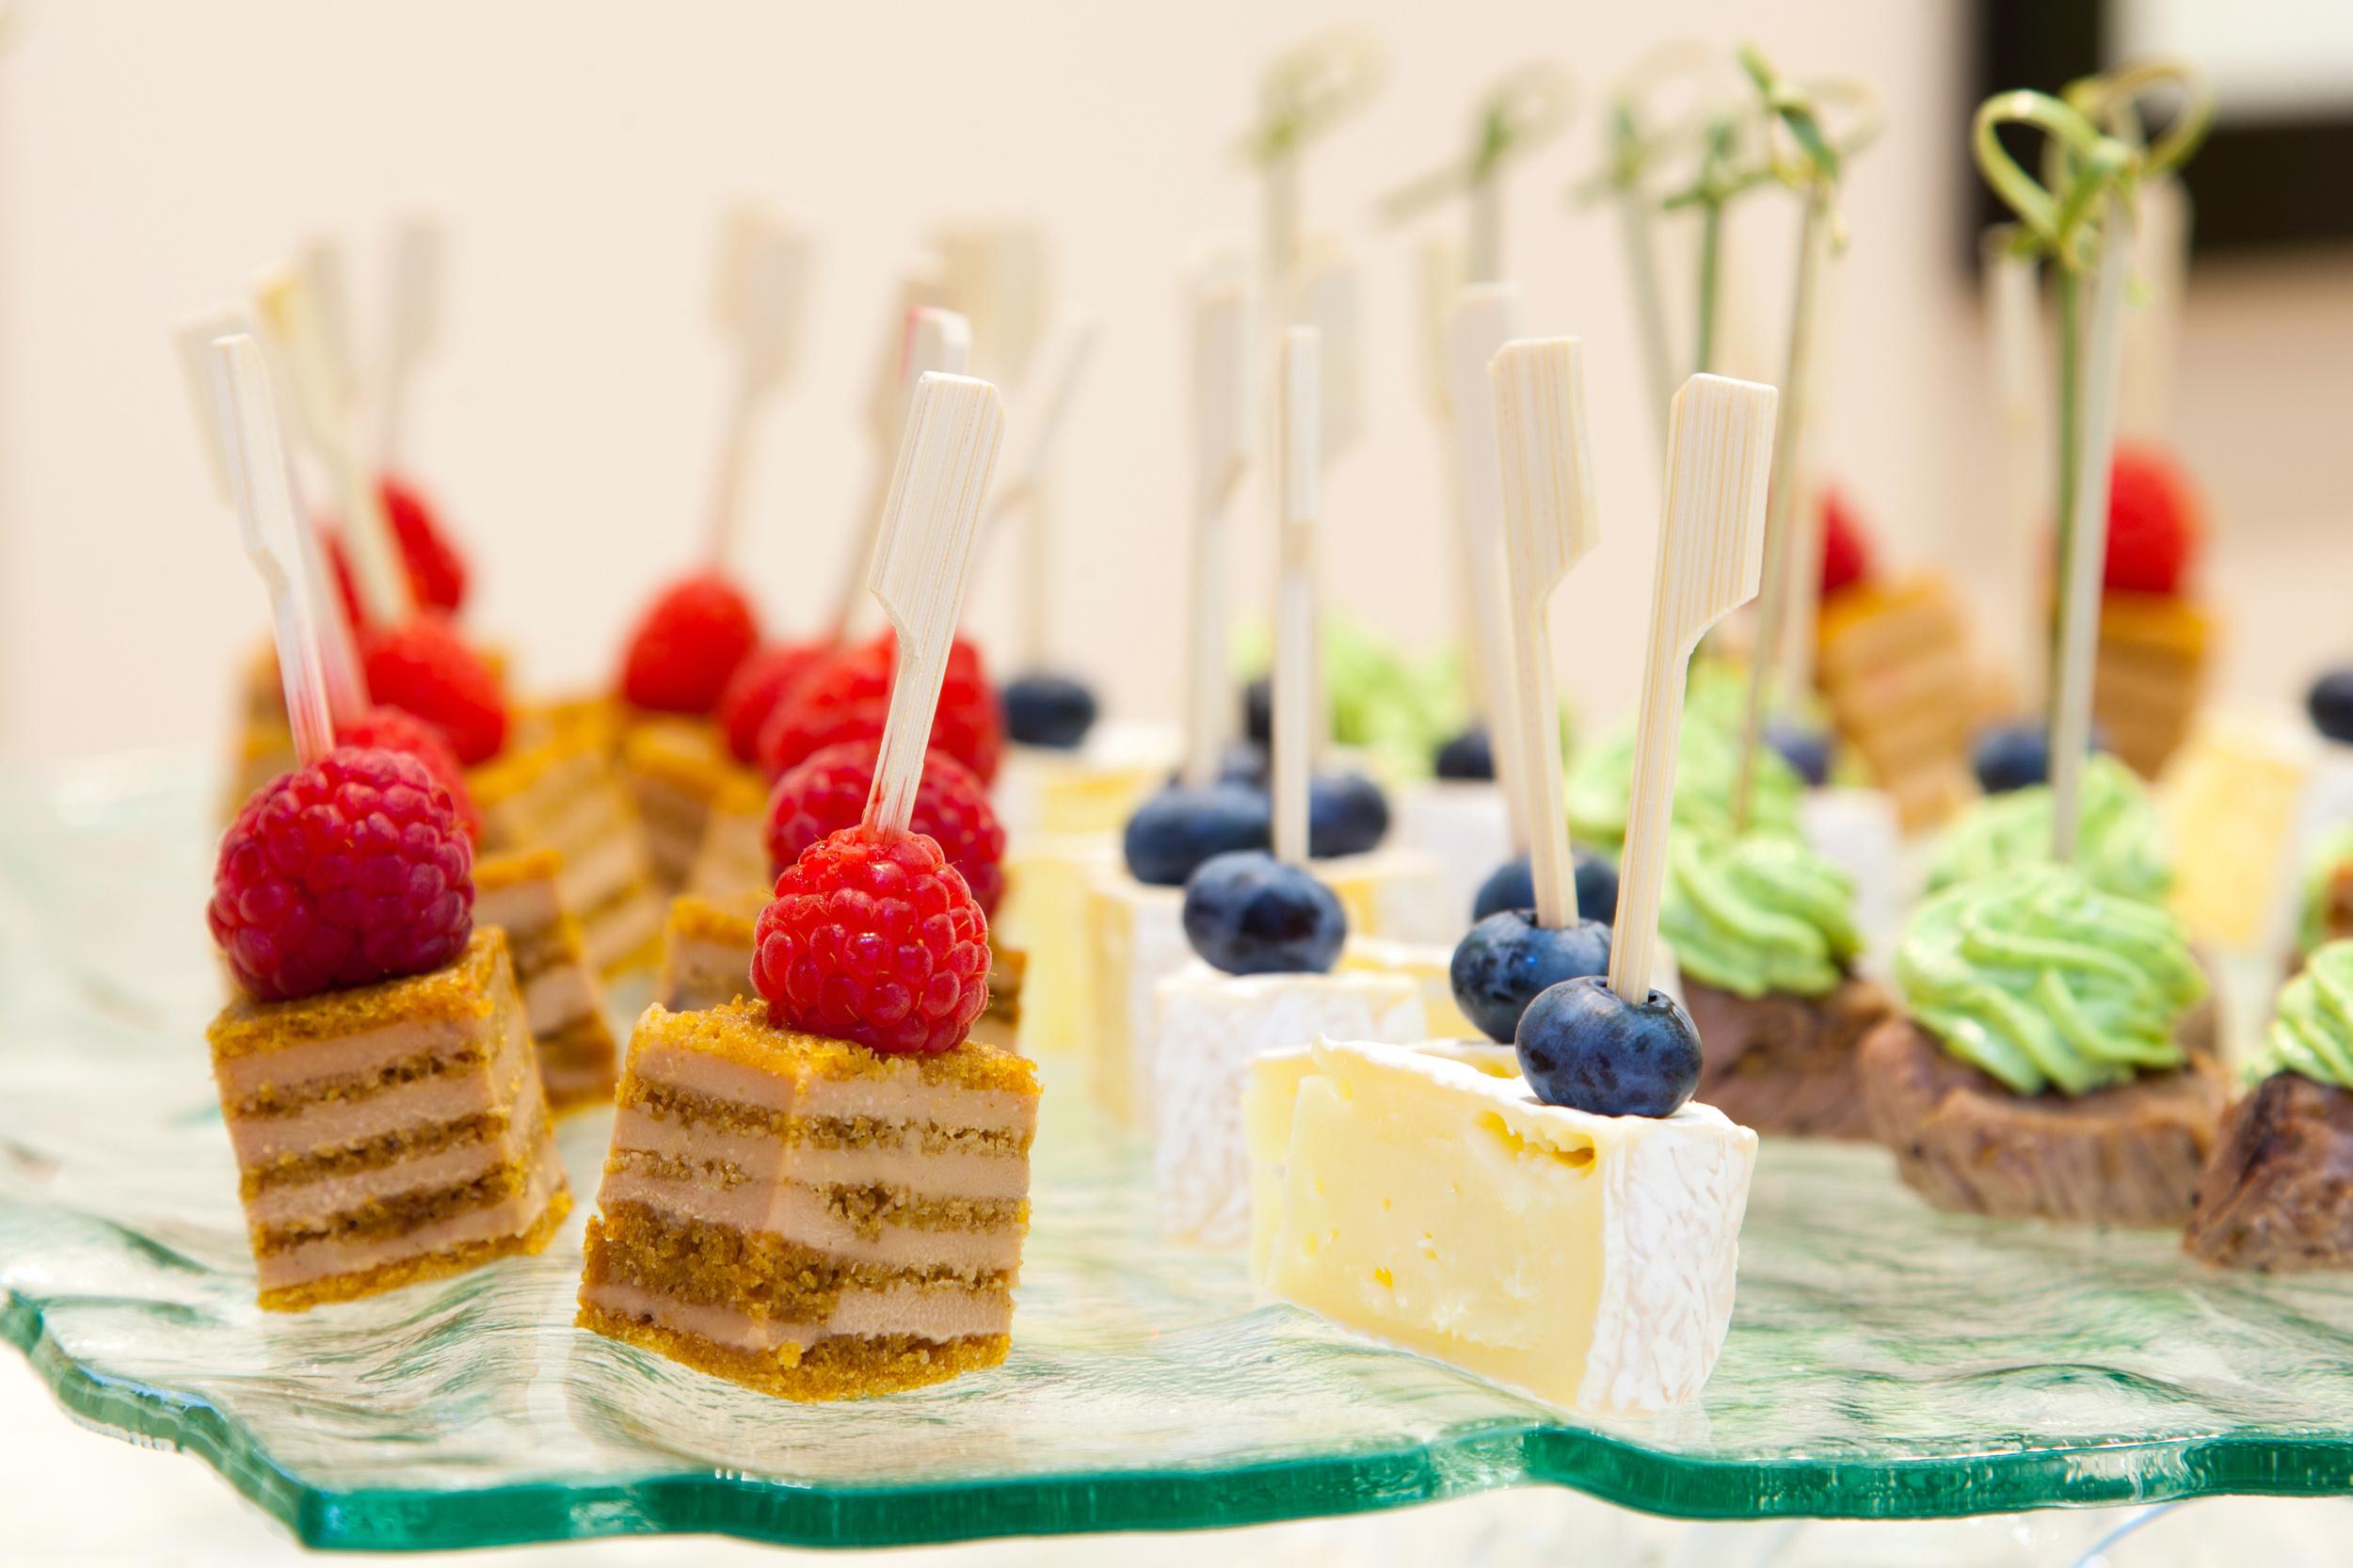 dessert3 copy.jpg